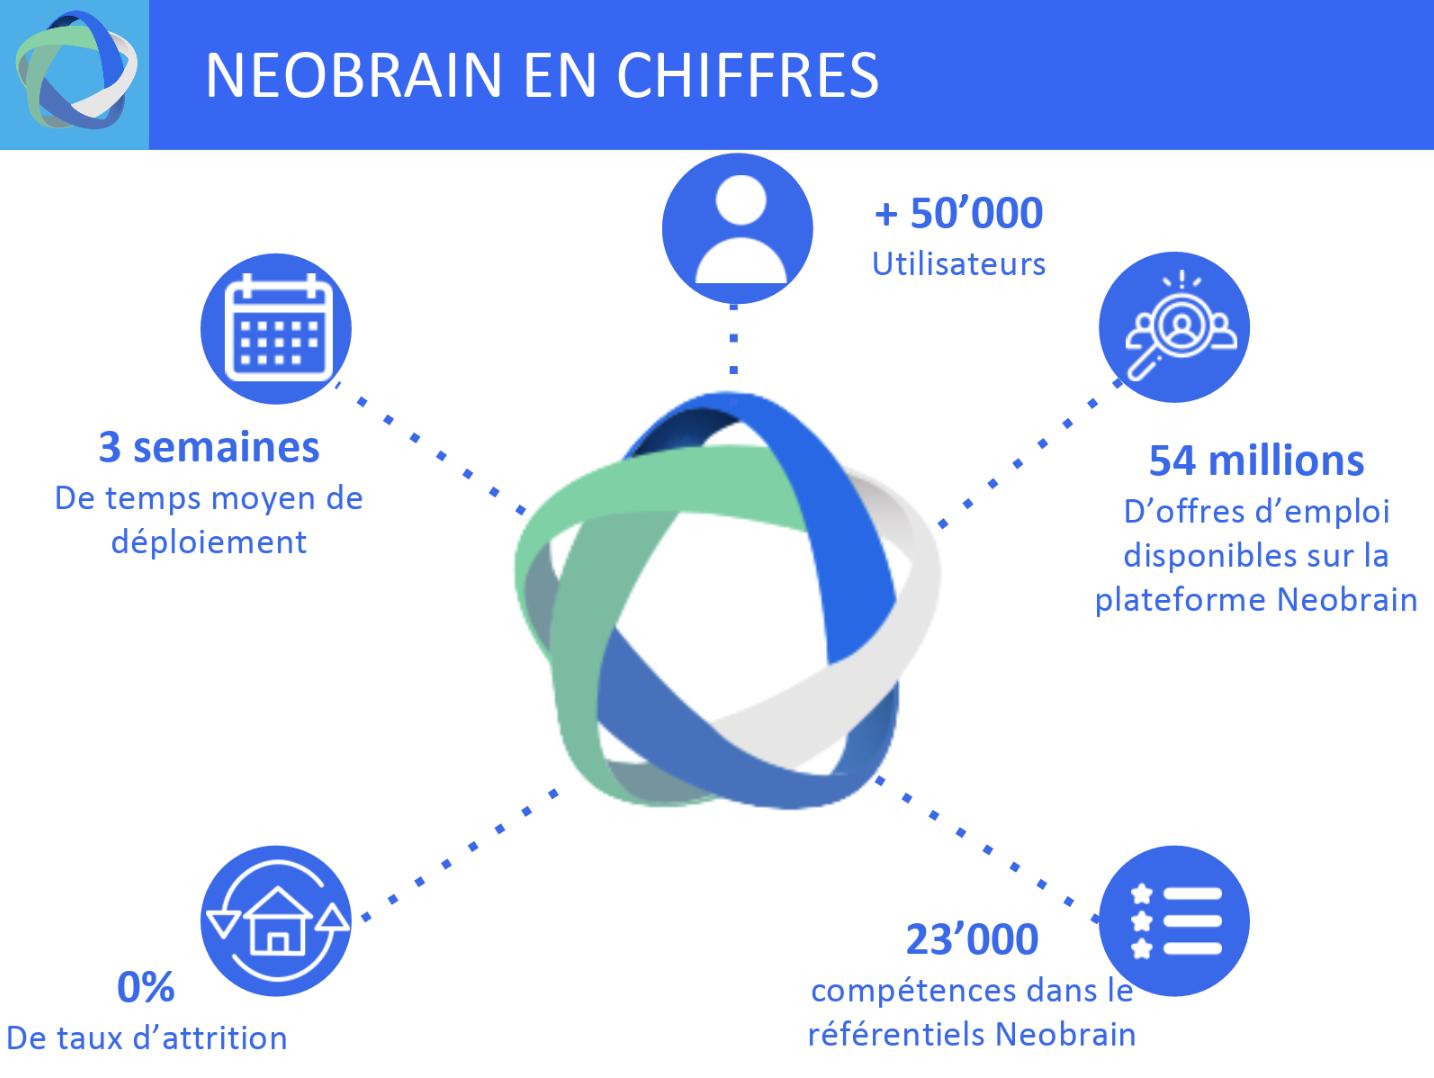 Neobrain aide à la transformation digitale des RH